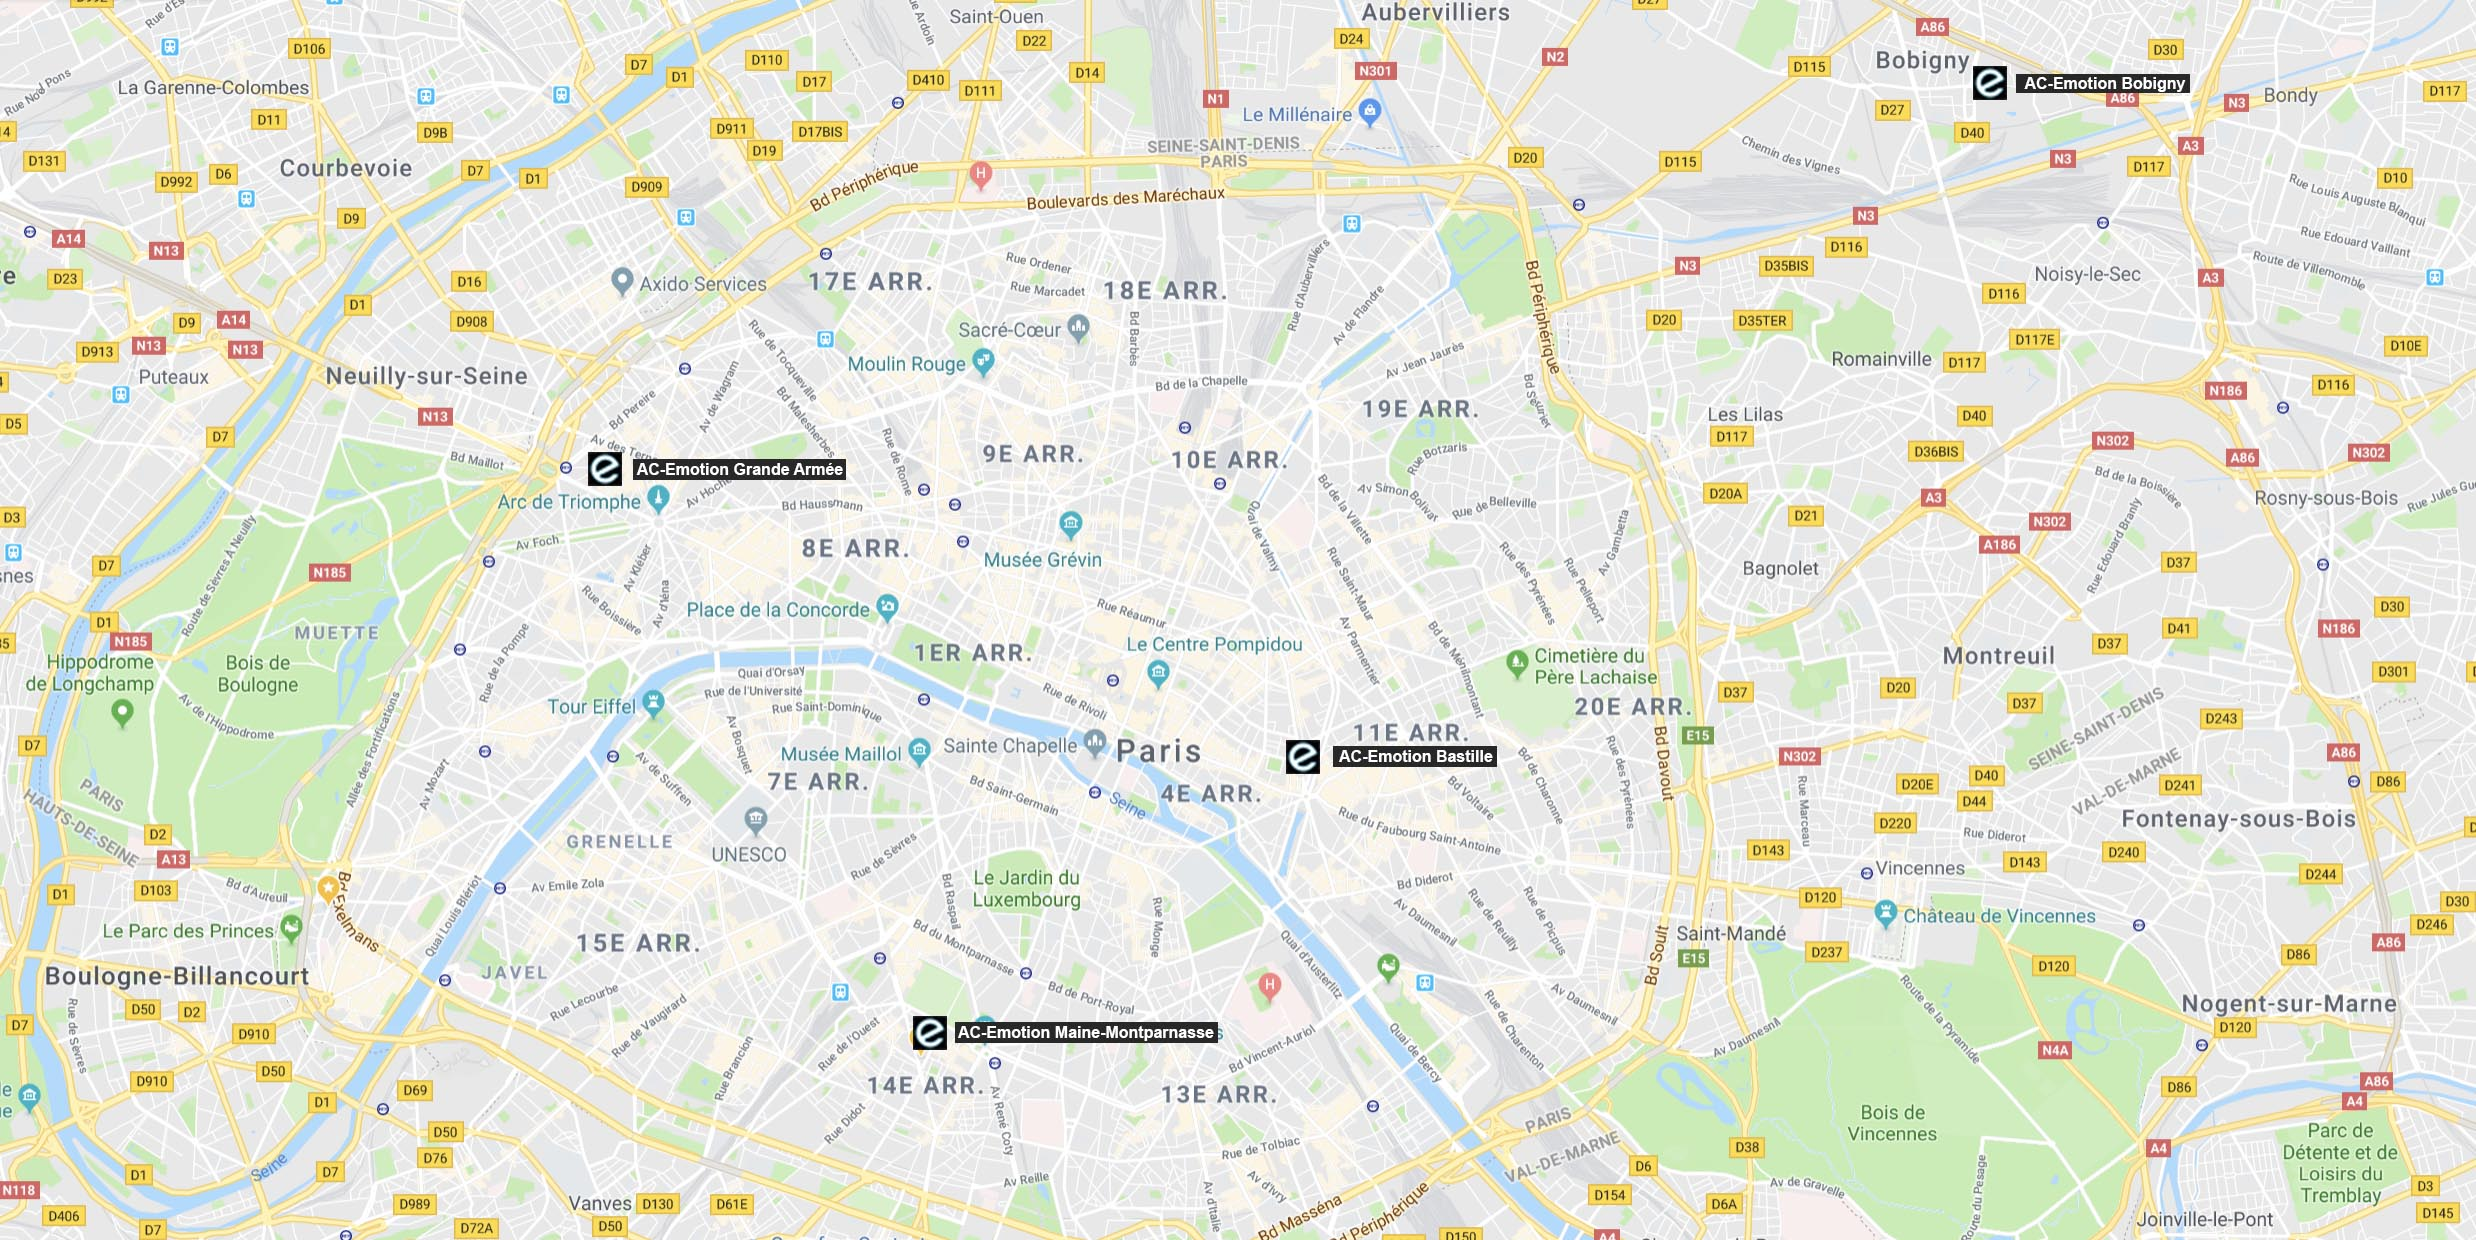 AC-Emotion : Bastille, Maine-Montparnasse, Grande Armée, Bobigny